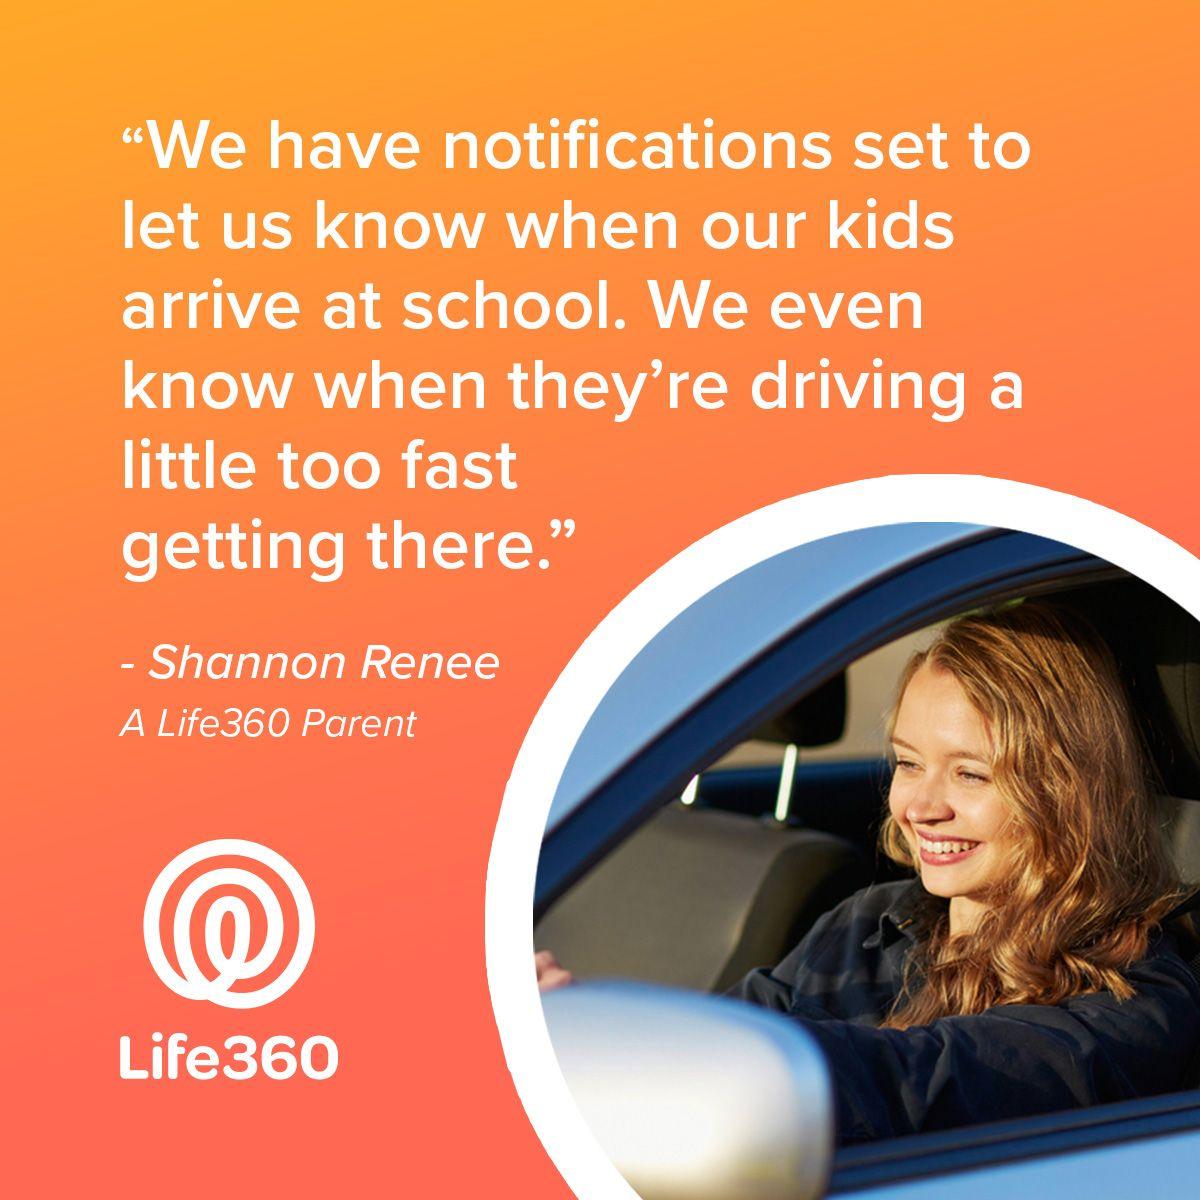 Life360 on Twitter: